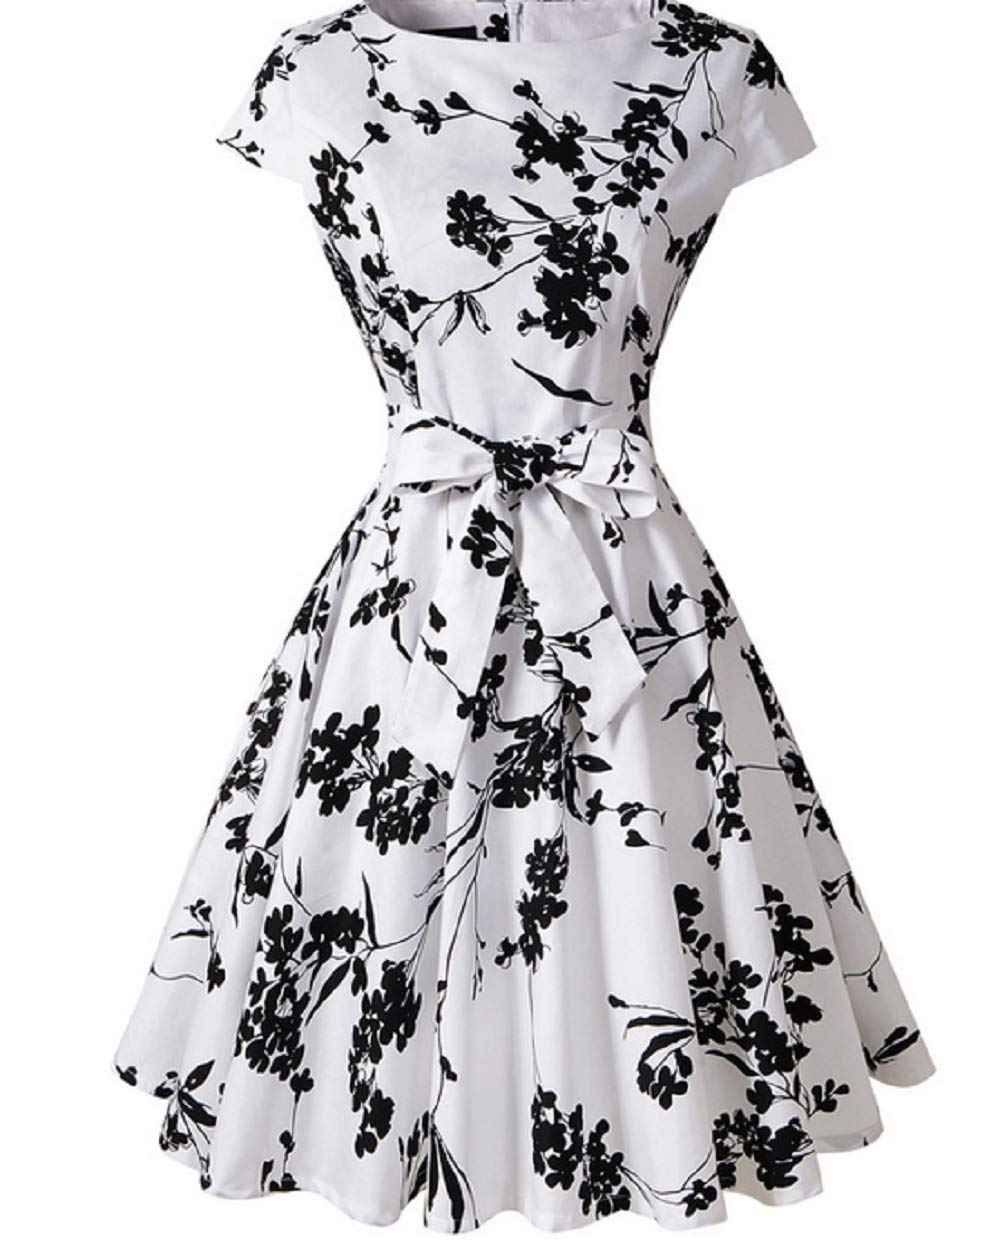 Blackfloweronwhite Women Cocktail Dress Sleeveless Vintage Party Dress Swing Hepburn Party Dress